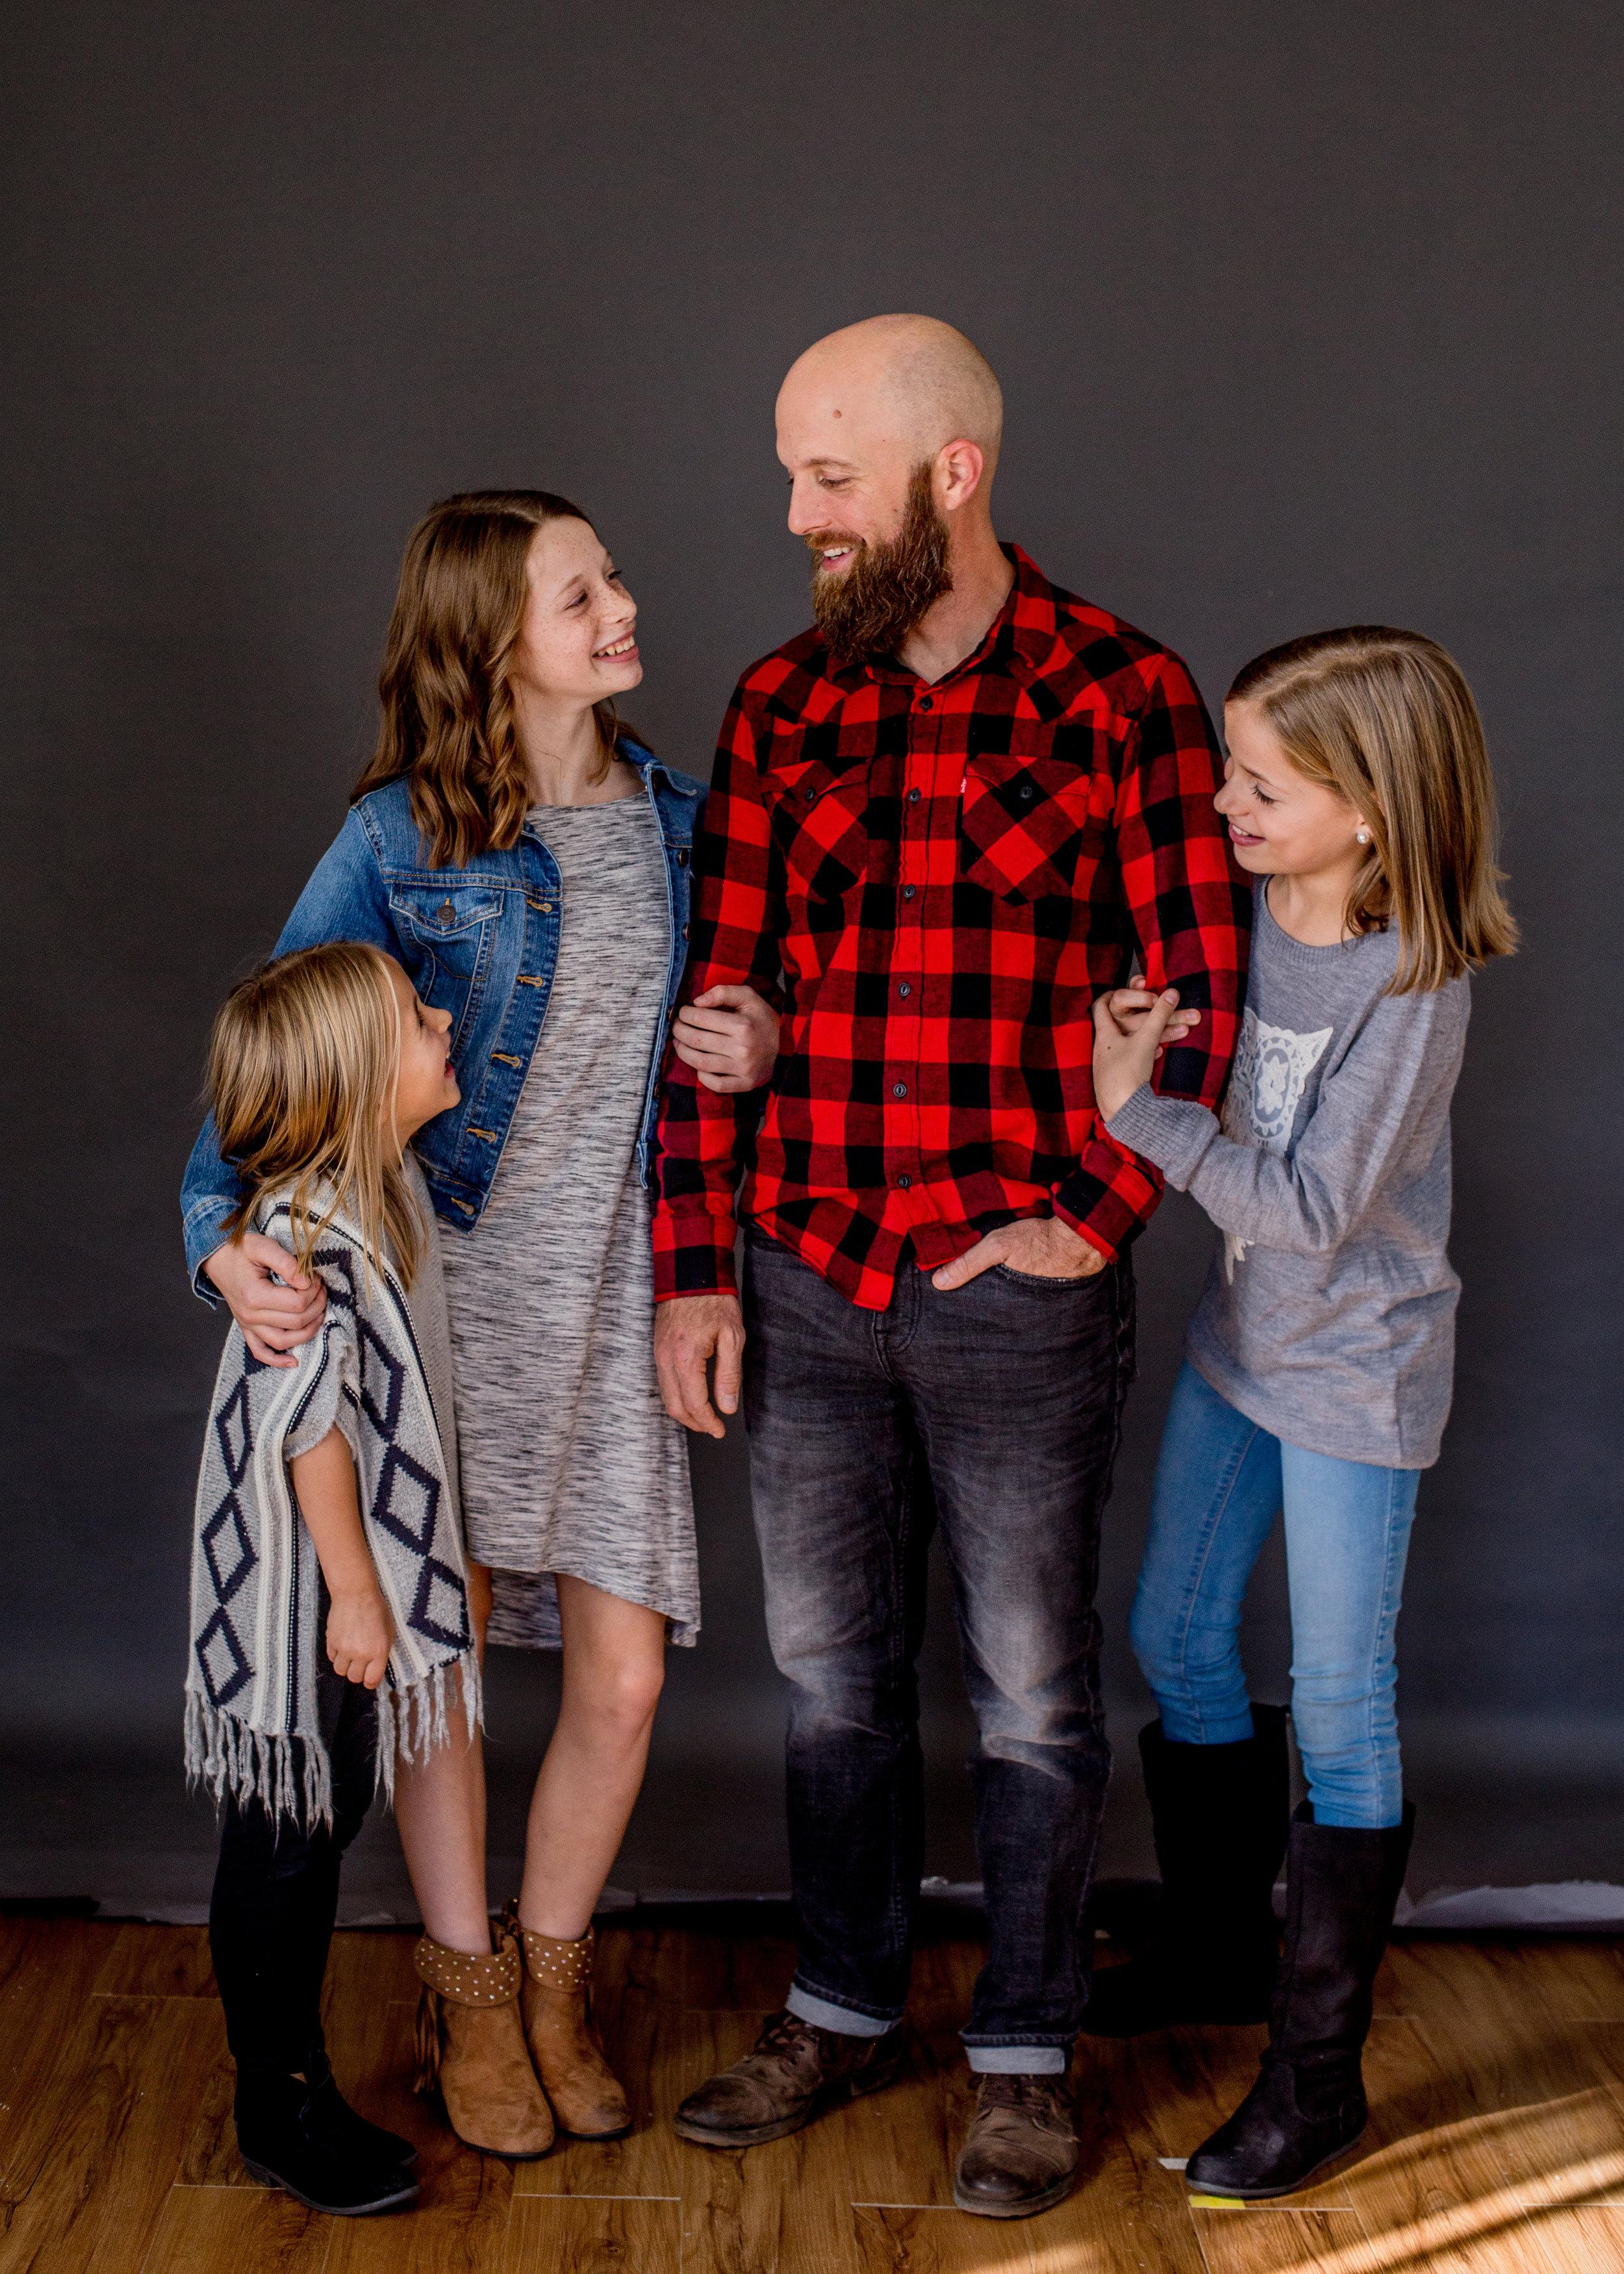 standrodfamily2018-61.jpg